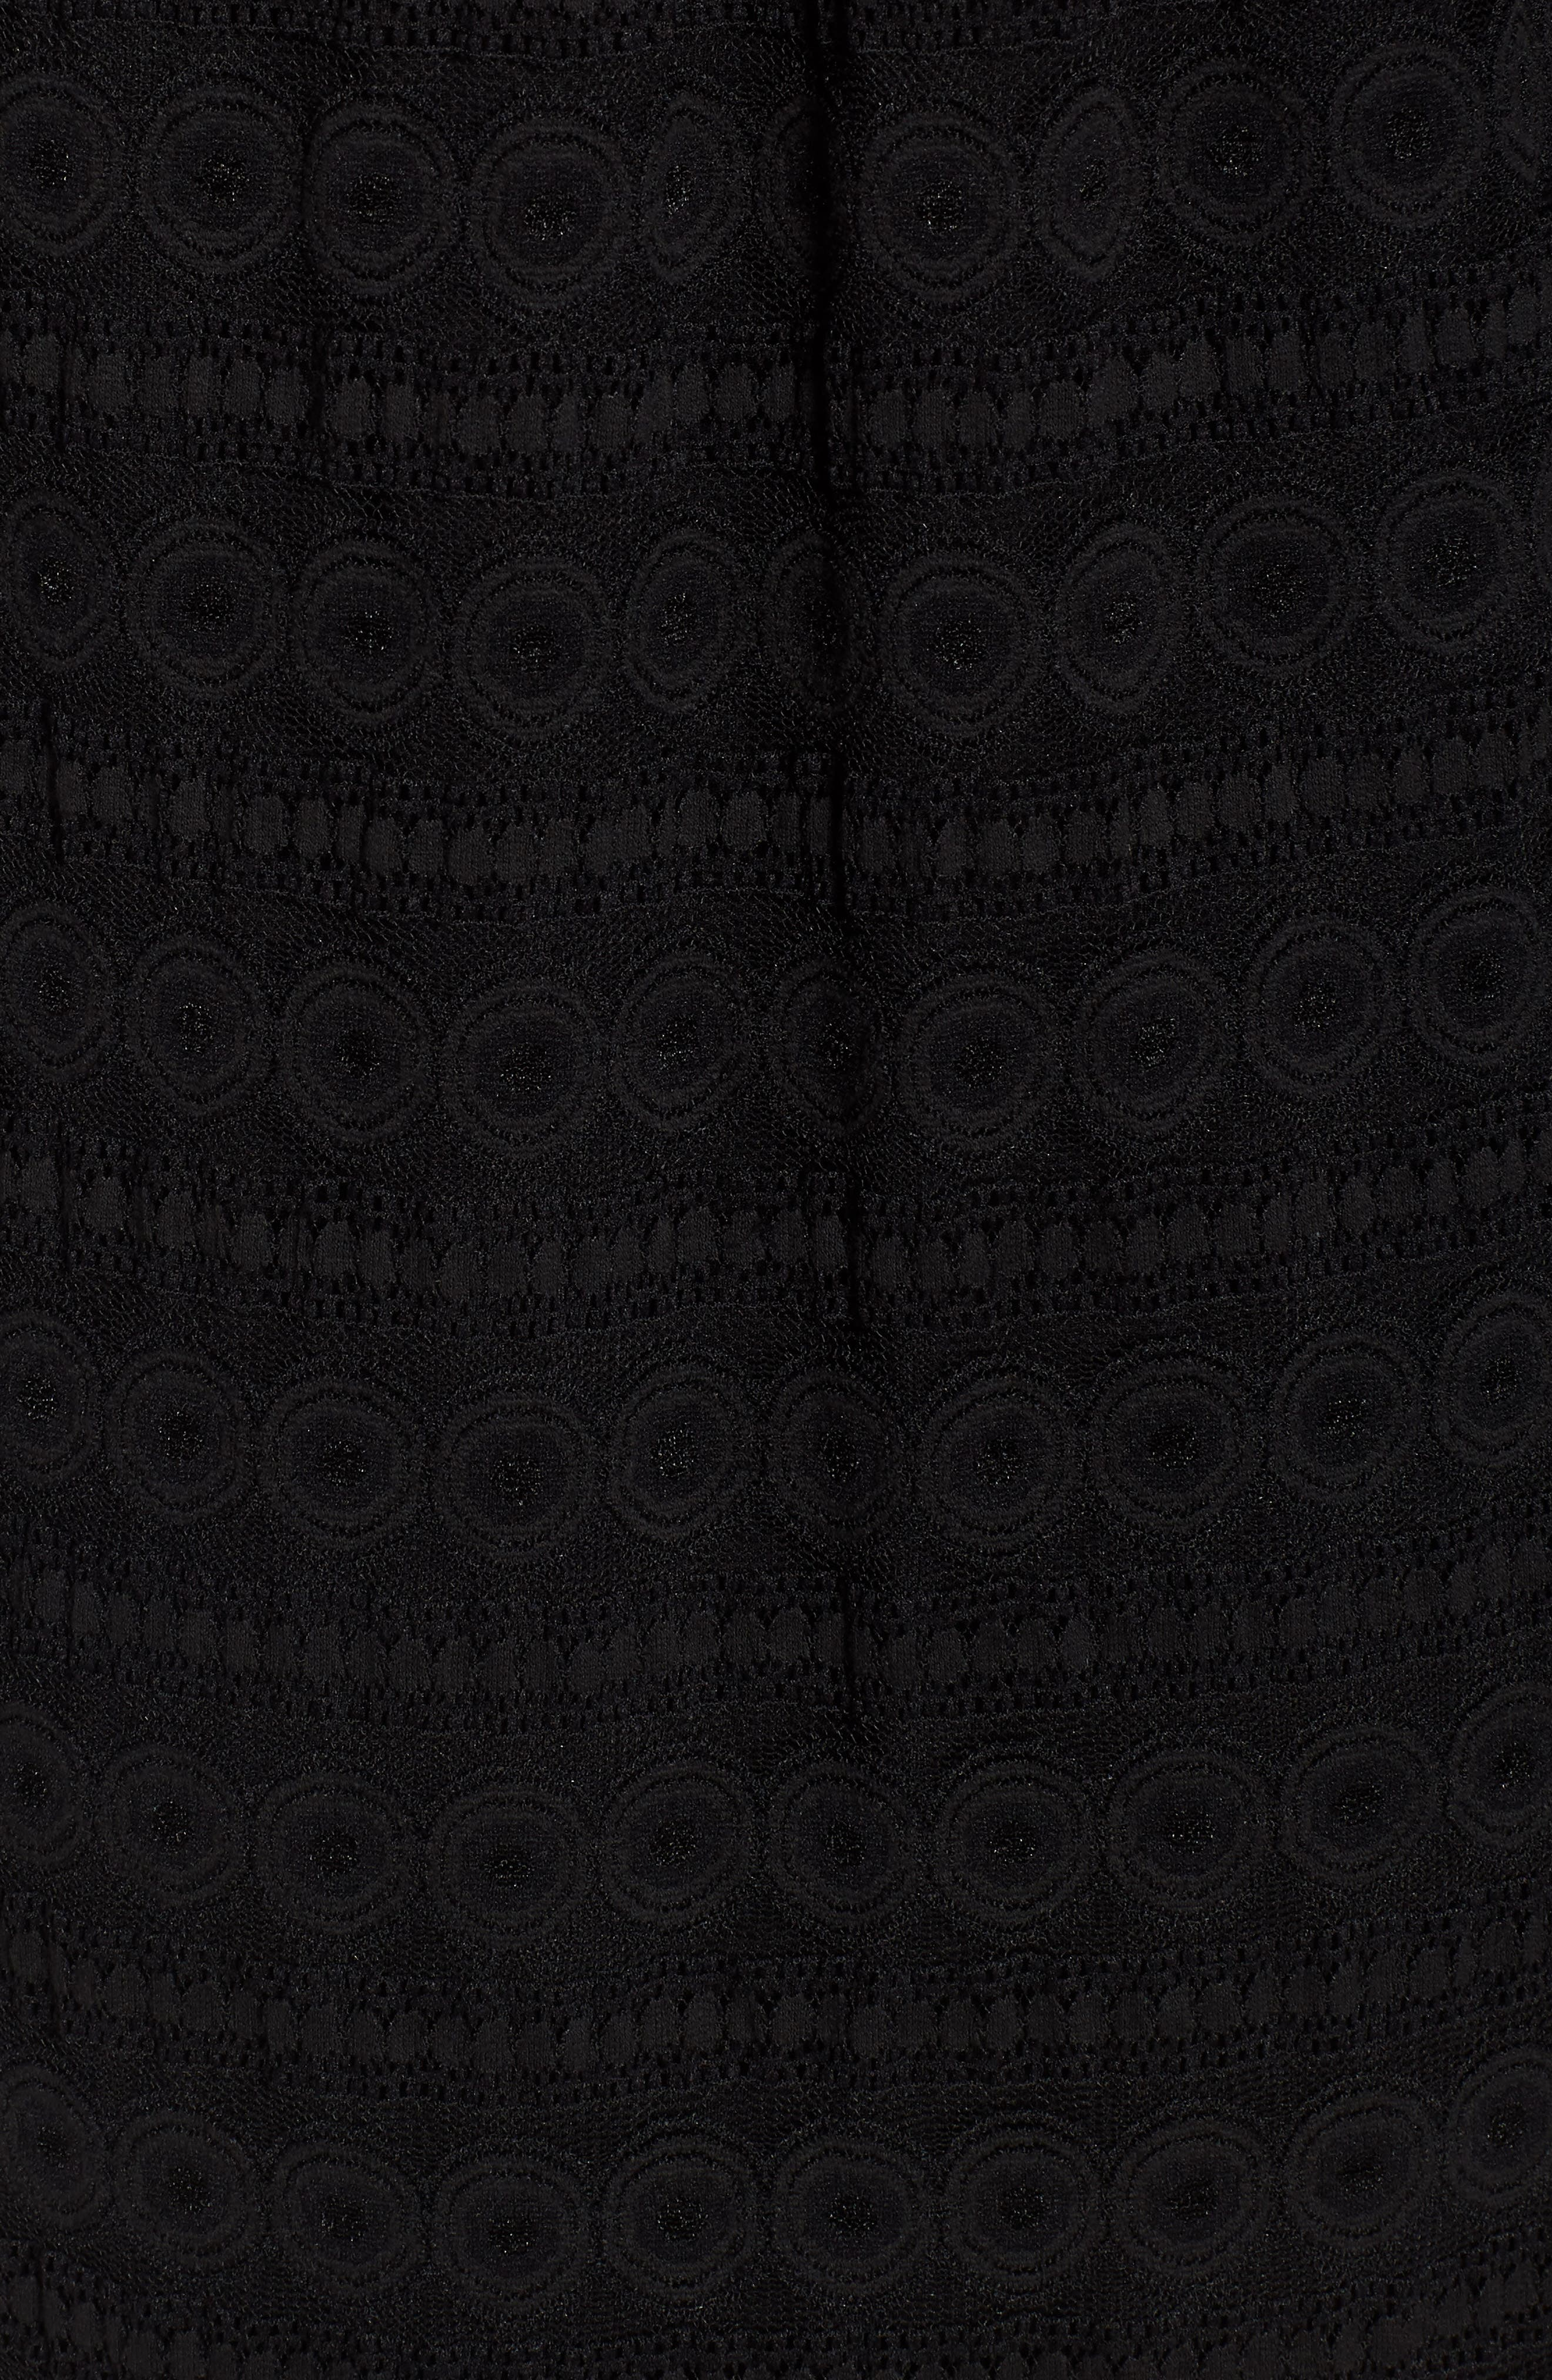 Circle Medallion Lace Off the Shoulder Dress,                             Alternate thumbnail 6, color,                             Black